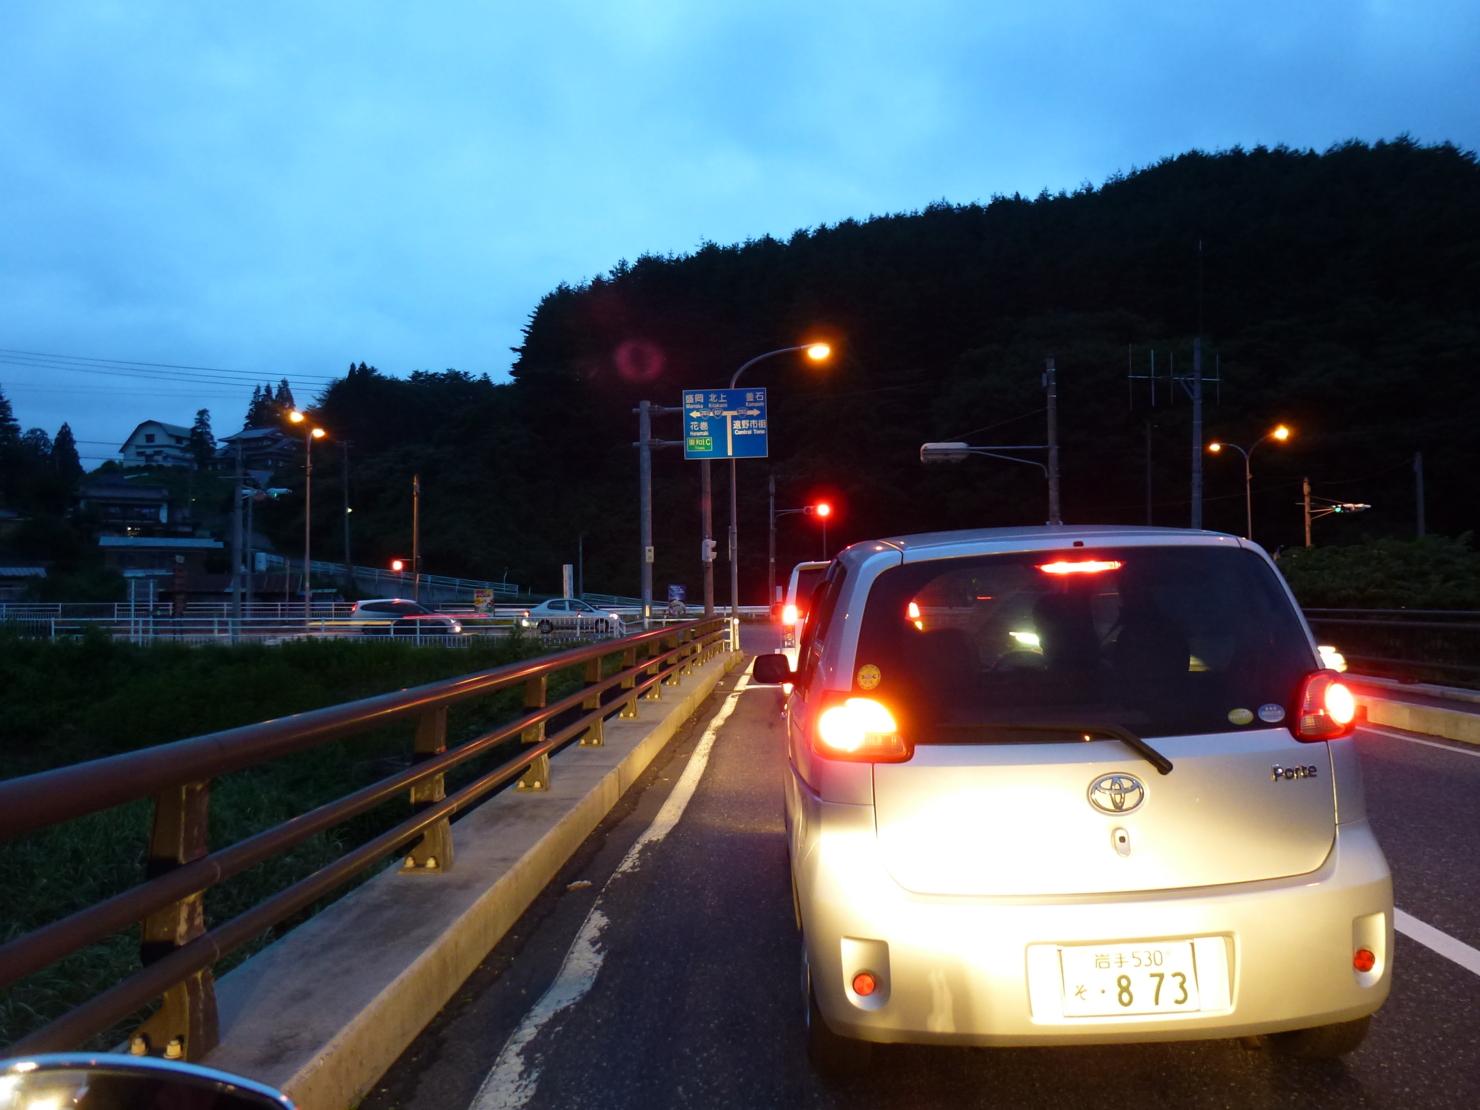 f:id:ToshUeno:20130831181344j:plain